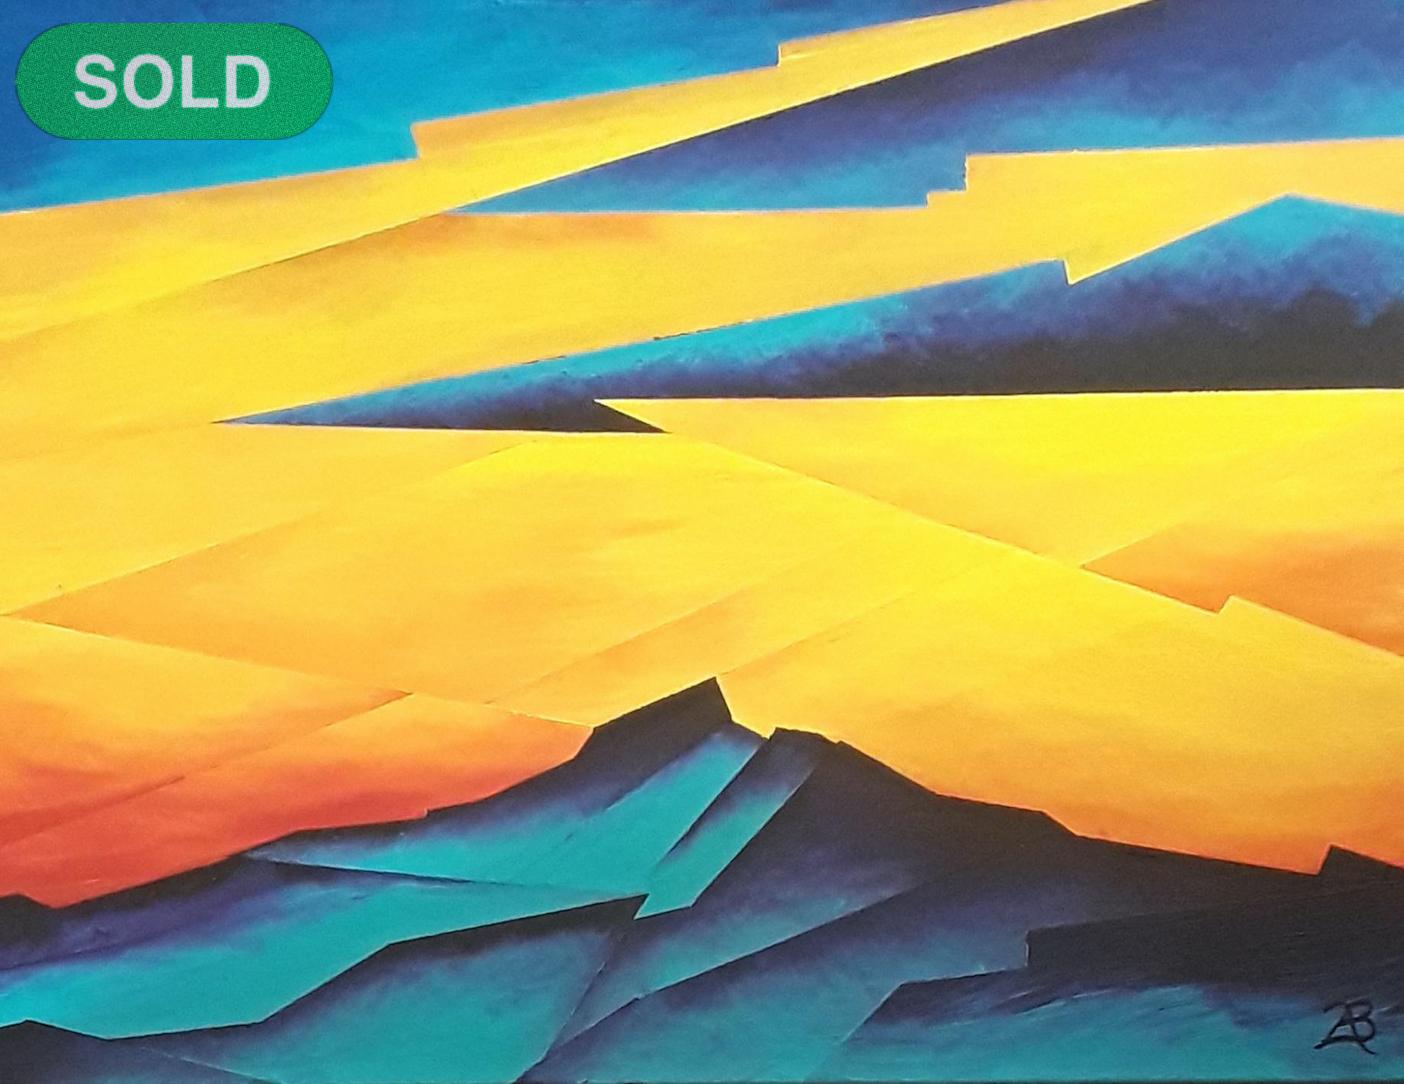 Brandon Allebach: The Blue SOLD